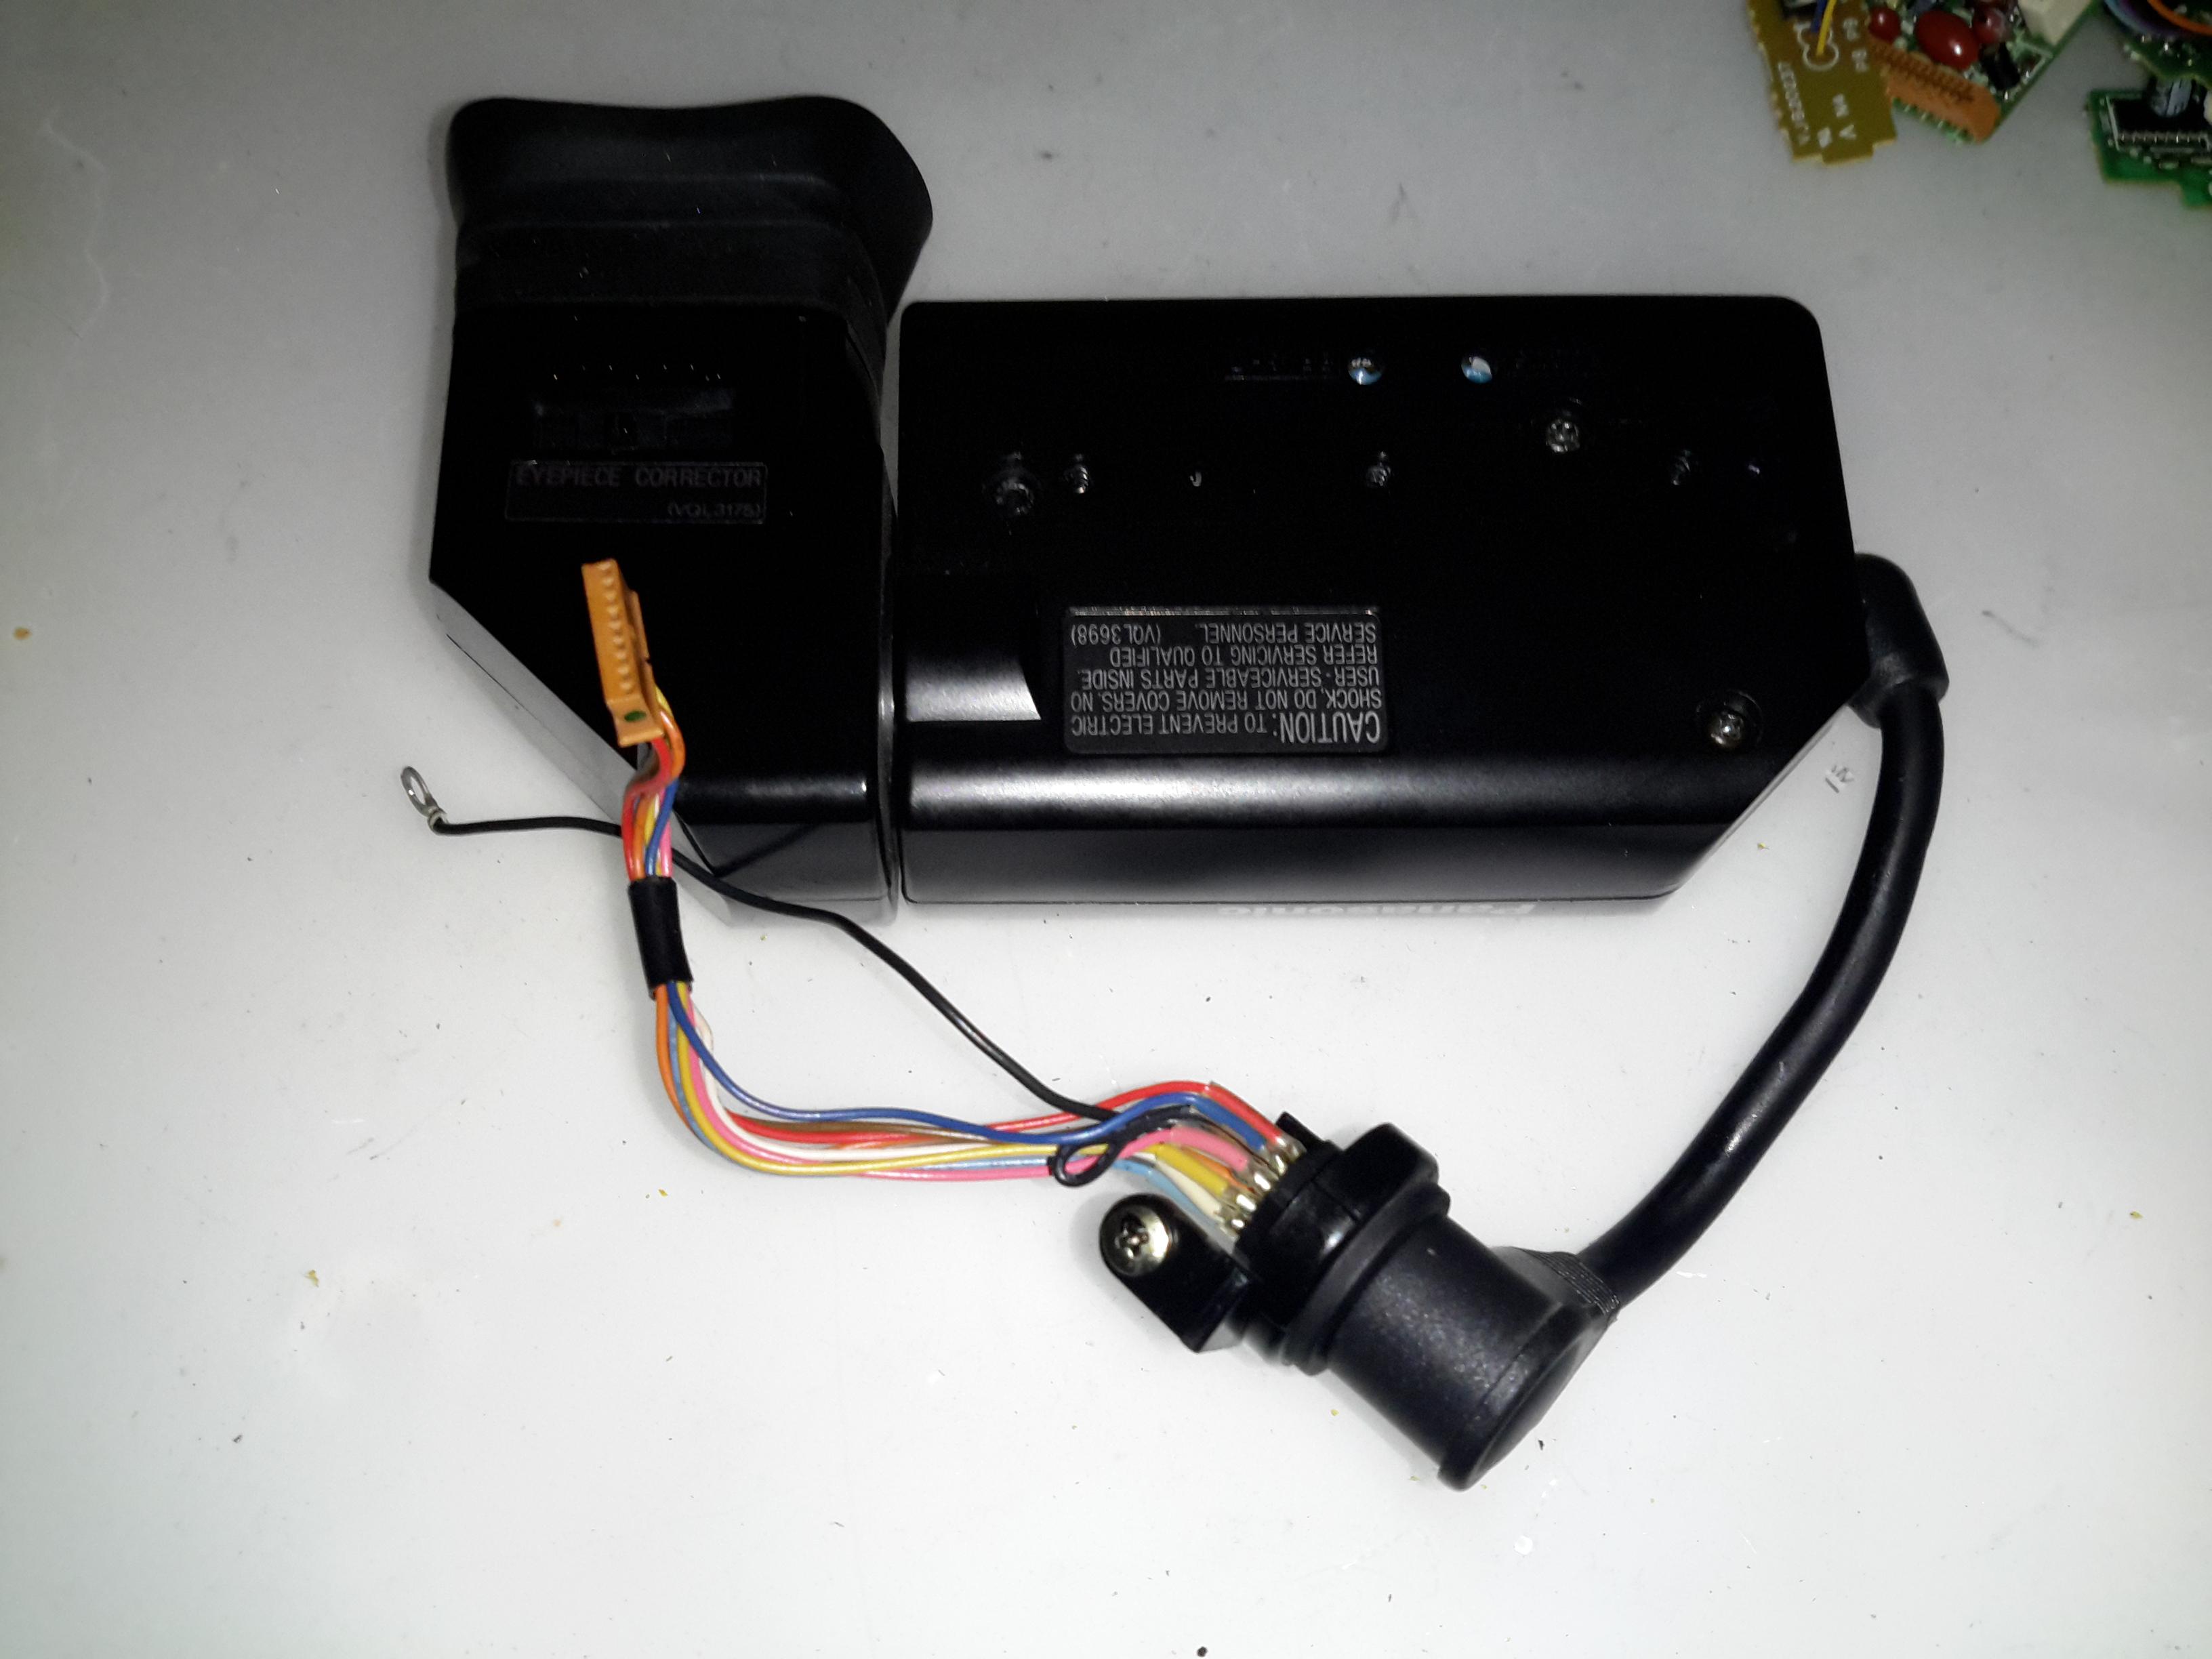 Panasonic NV-M5 VHS Camcorder Teardown - Experimental